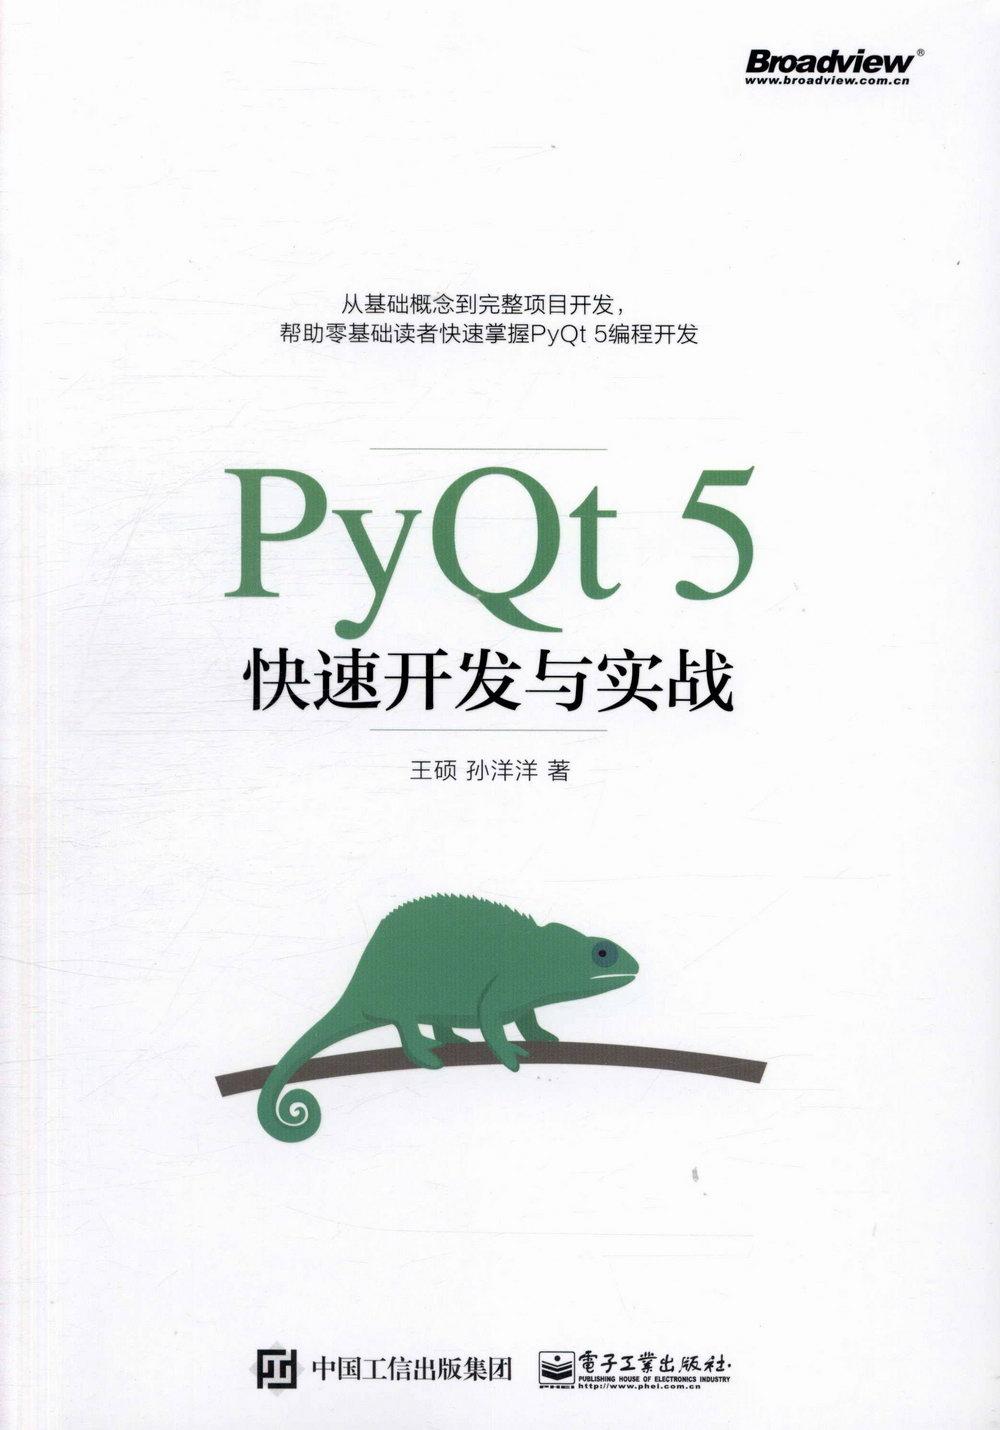 PyQt5快速開發與實戰